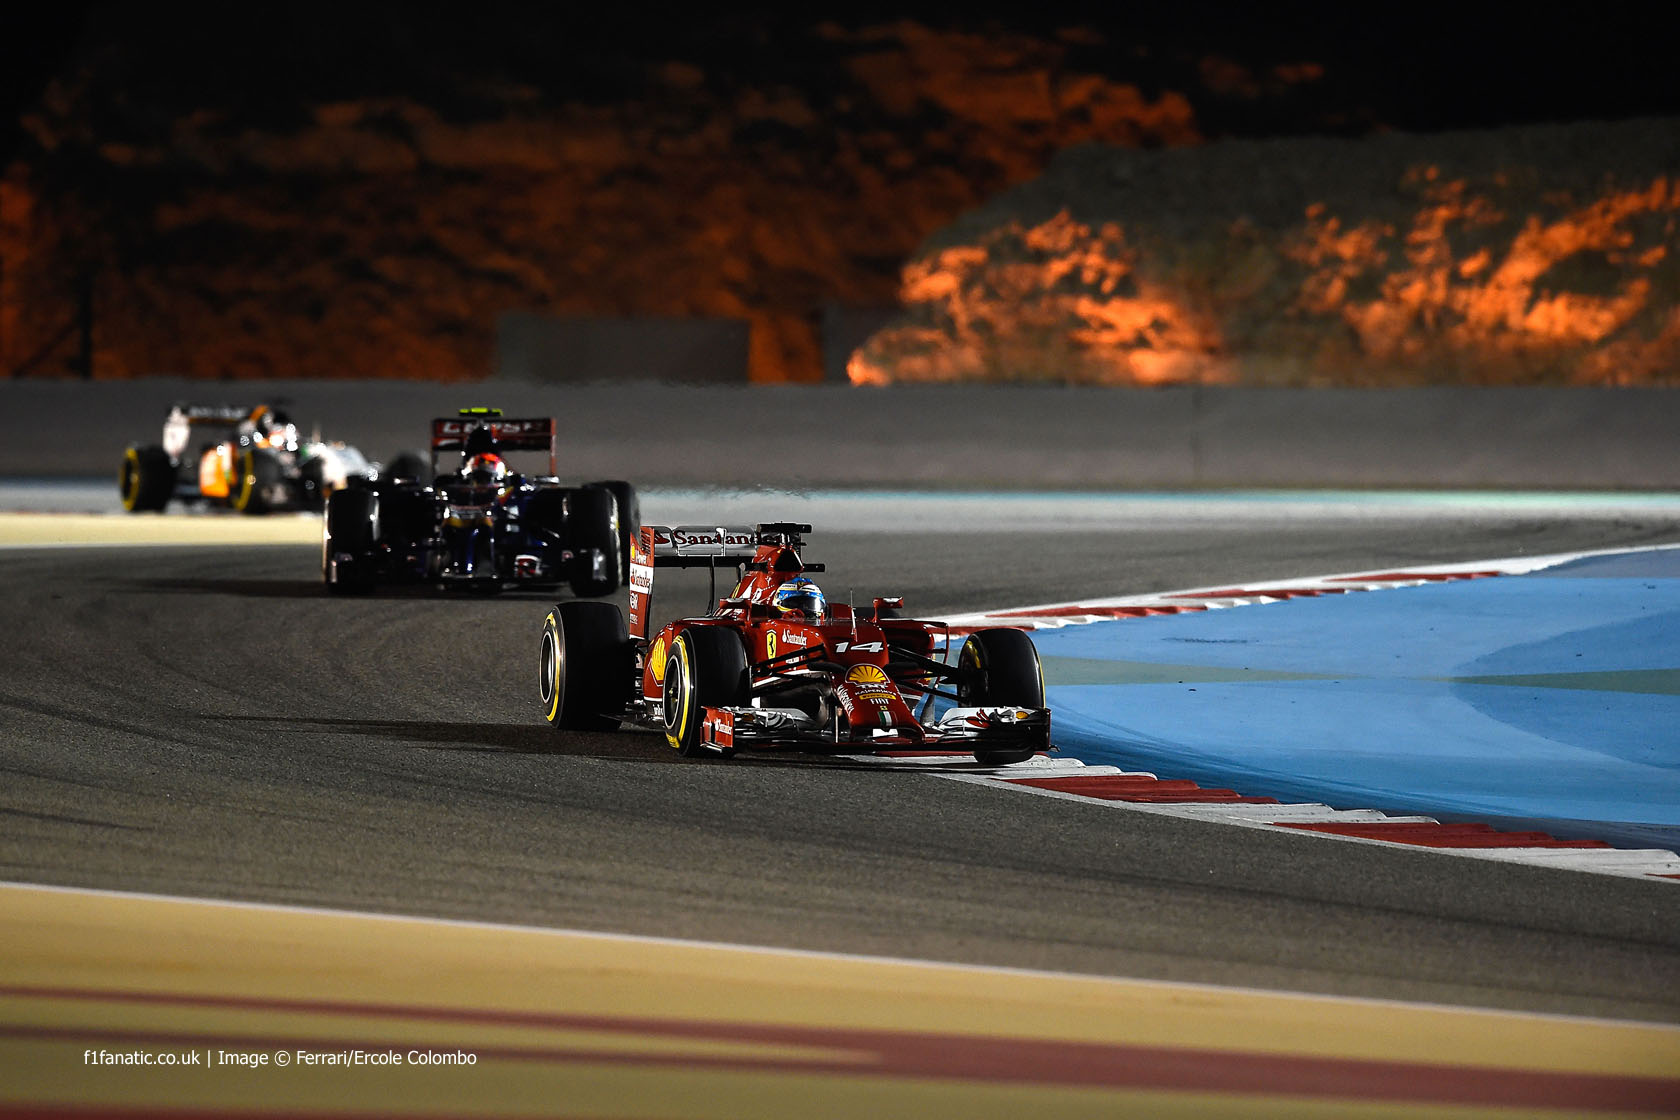 Fernando Alonso, Ferrari, Bahrain International Circuit, 2014